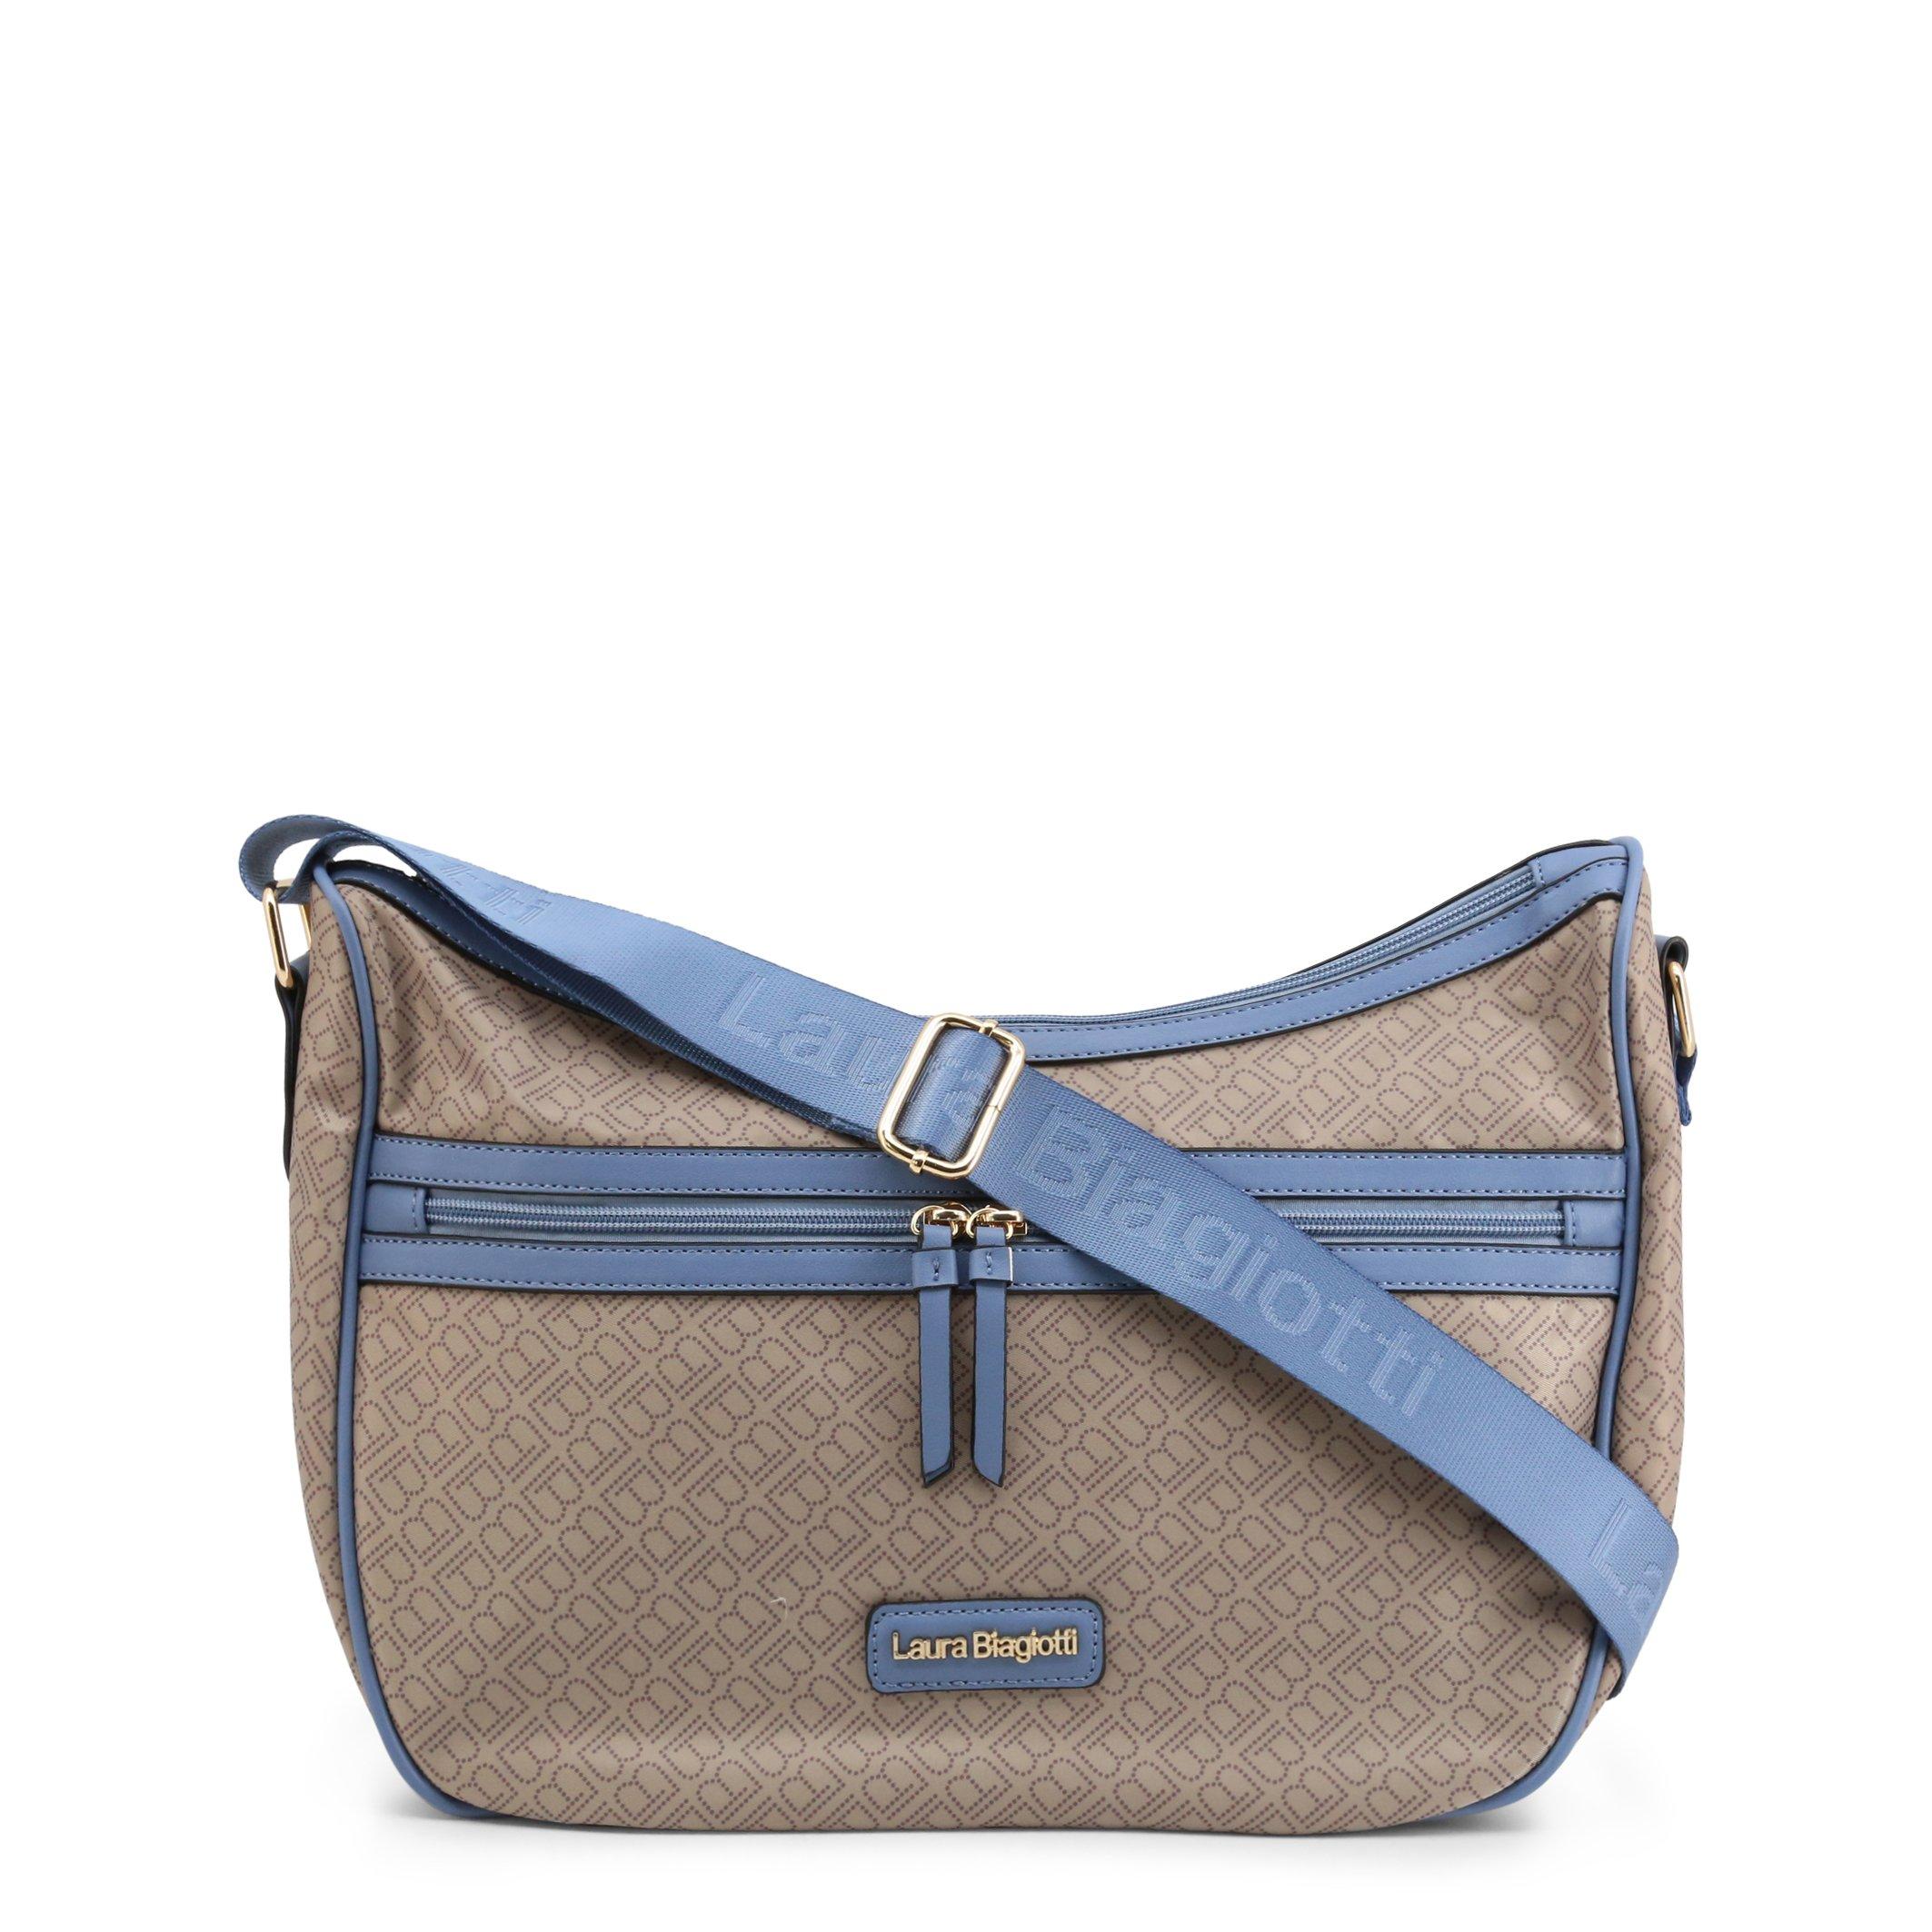 Laura Biagiotti Women's Crossbody Bag Brown Thia-105-11 - brown-2 NOSIZE